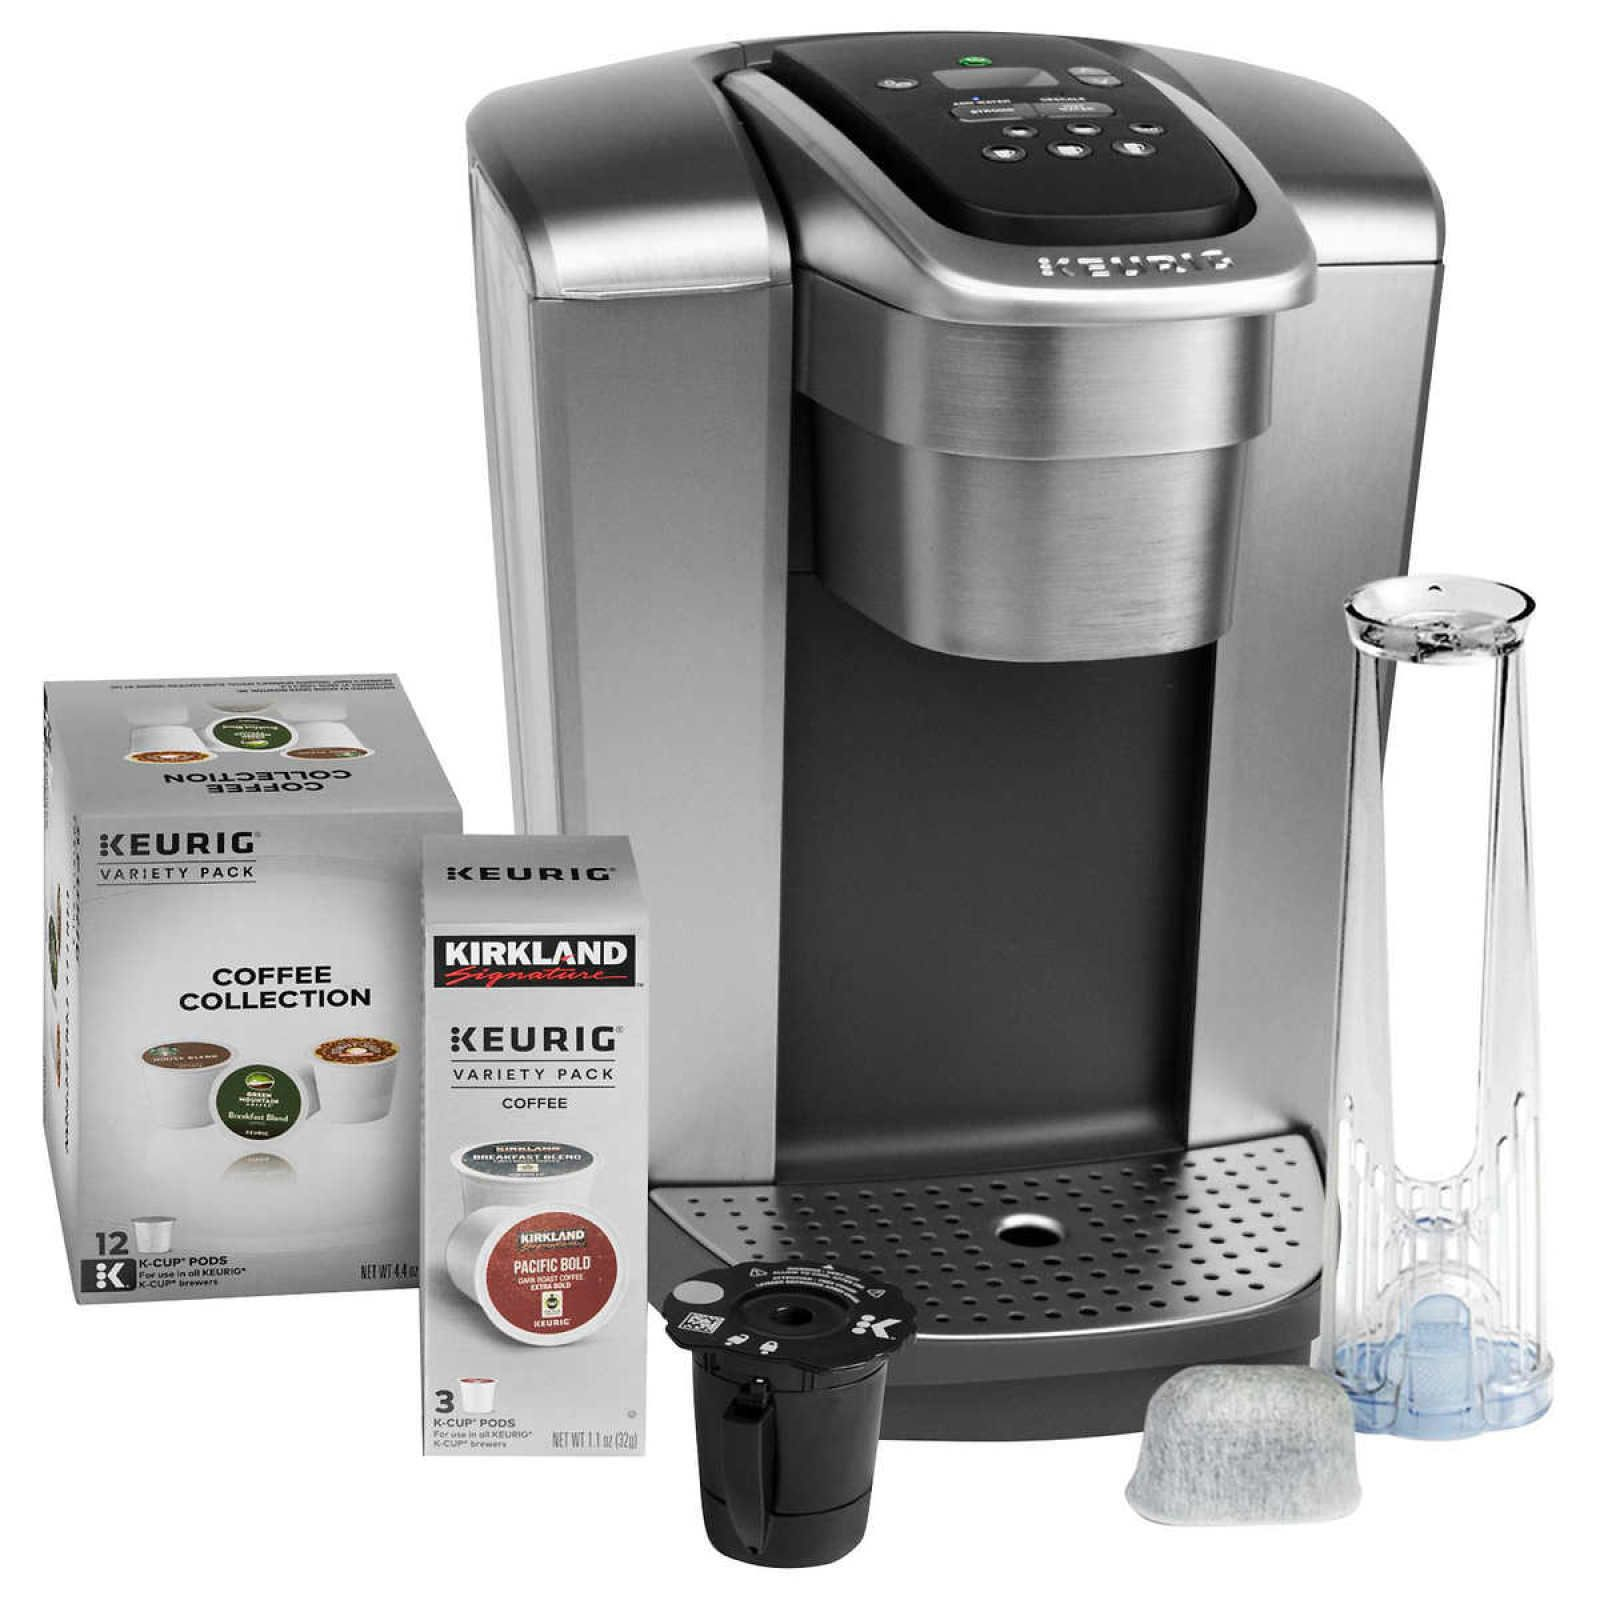 Keurig K-Elite C Single Serve Coffee Maker15 K-Cup Pods